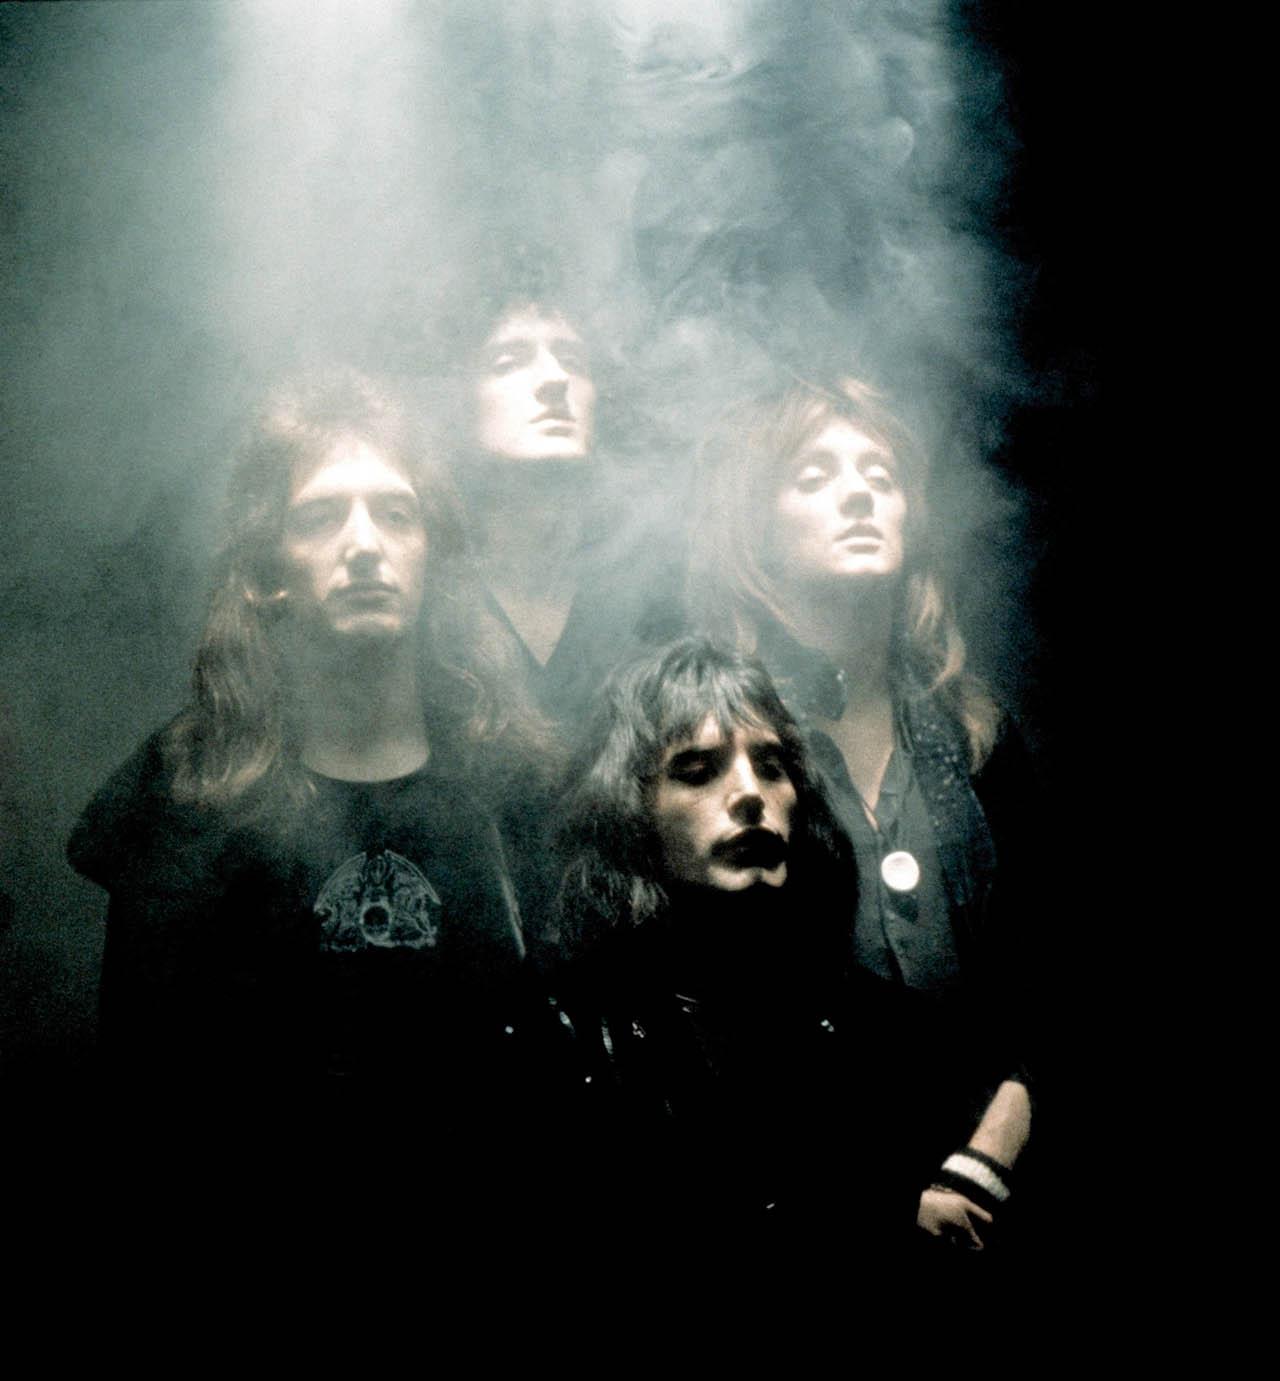 Queen Highlander Soundtrack: Bohemian Rhapsody OST To Release